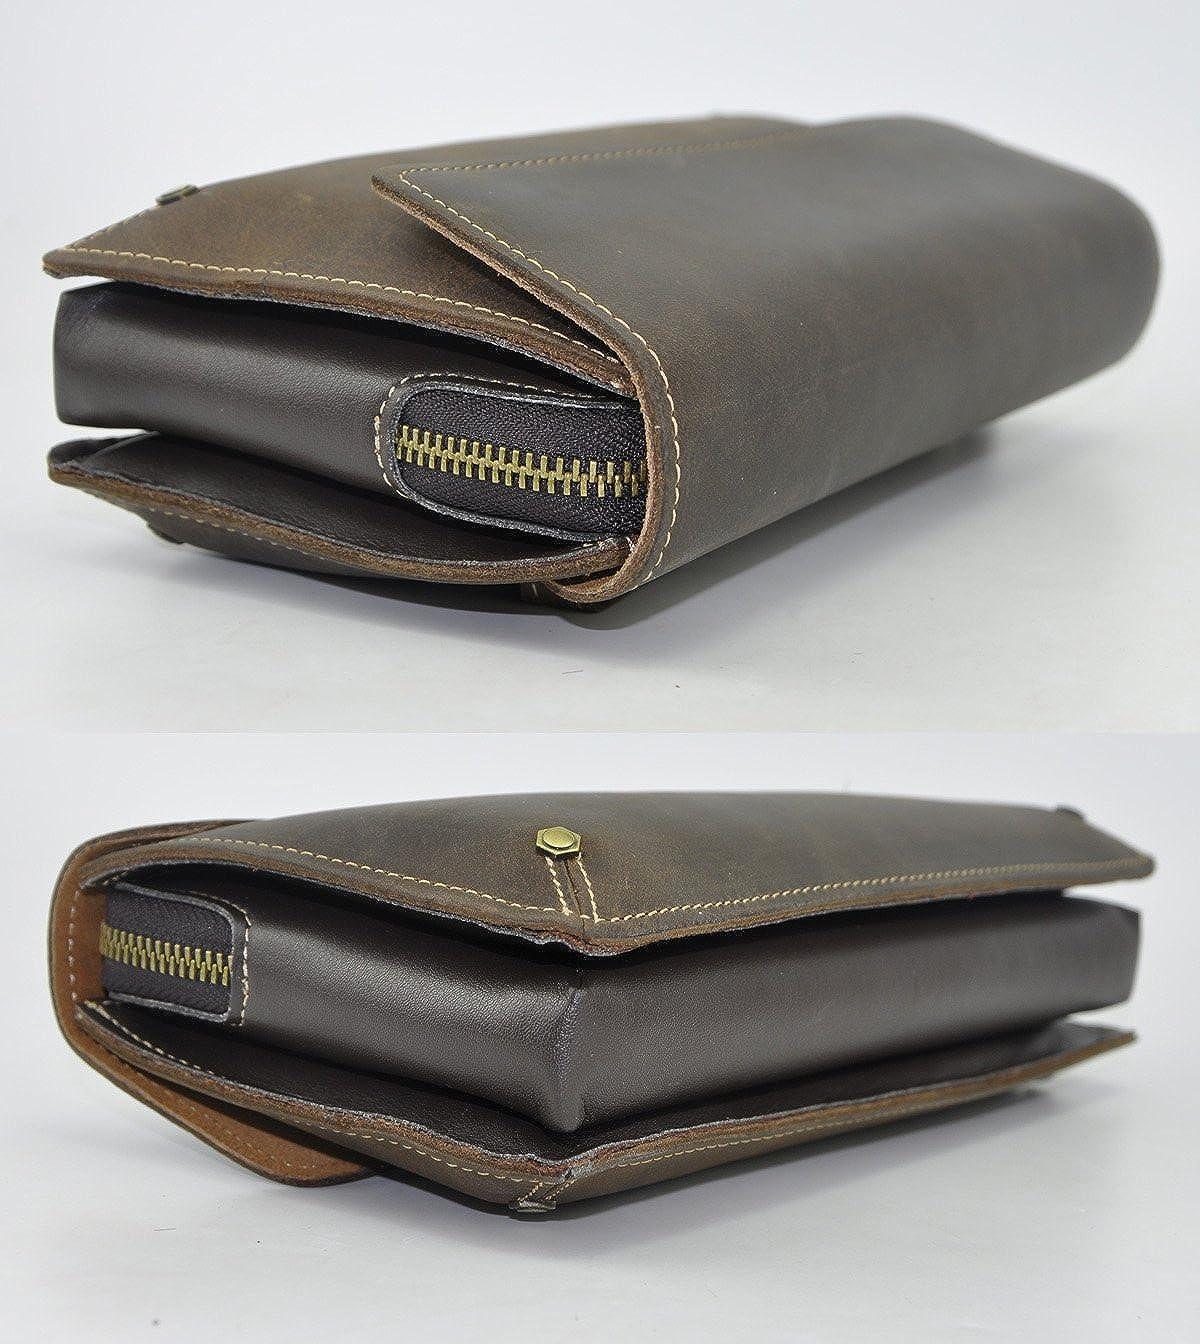 Leaokuu Men Leather Business Briefcase Clutch Hand Under Arm Bag Male Organizer Wallet Tablets Case